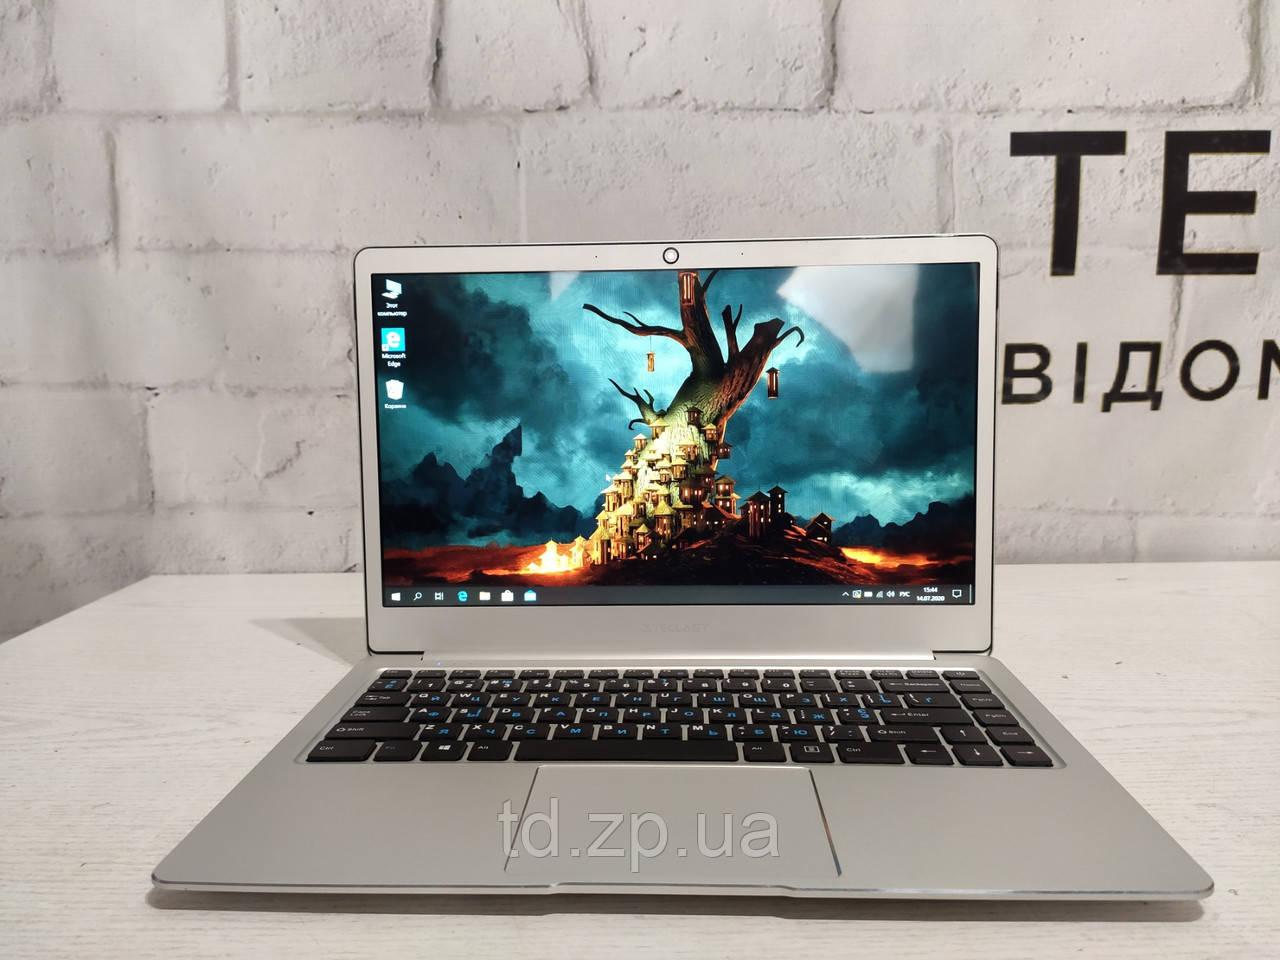 Ноутбук Teclast Tbook F7 14,1' / Intel N3450 / DDR 4 6Gb / 120Gb SSD / Intel HD Graphics 500